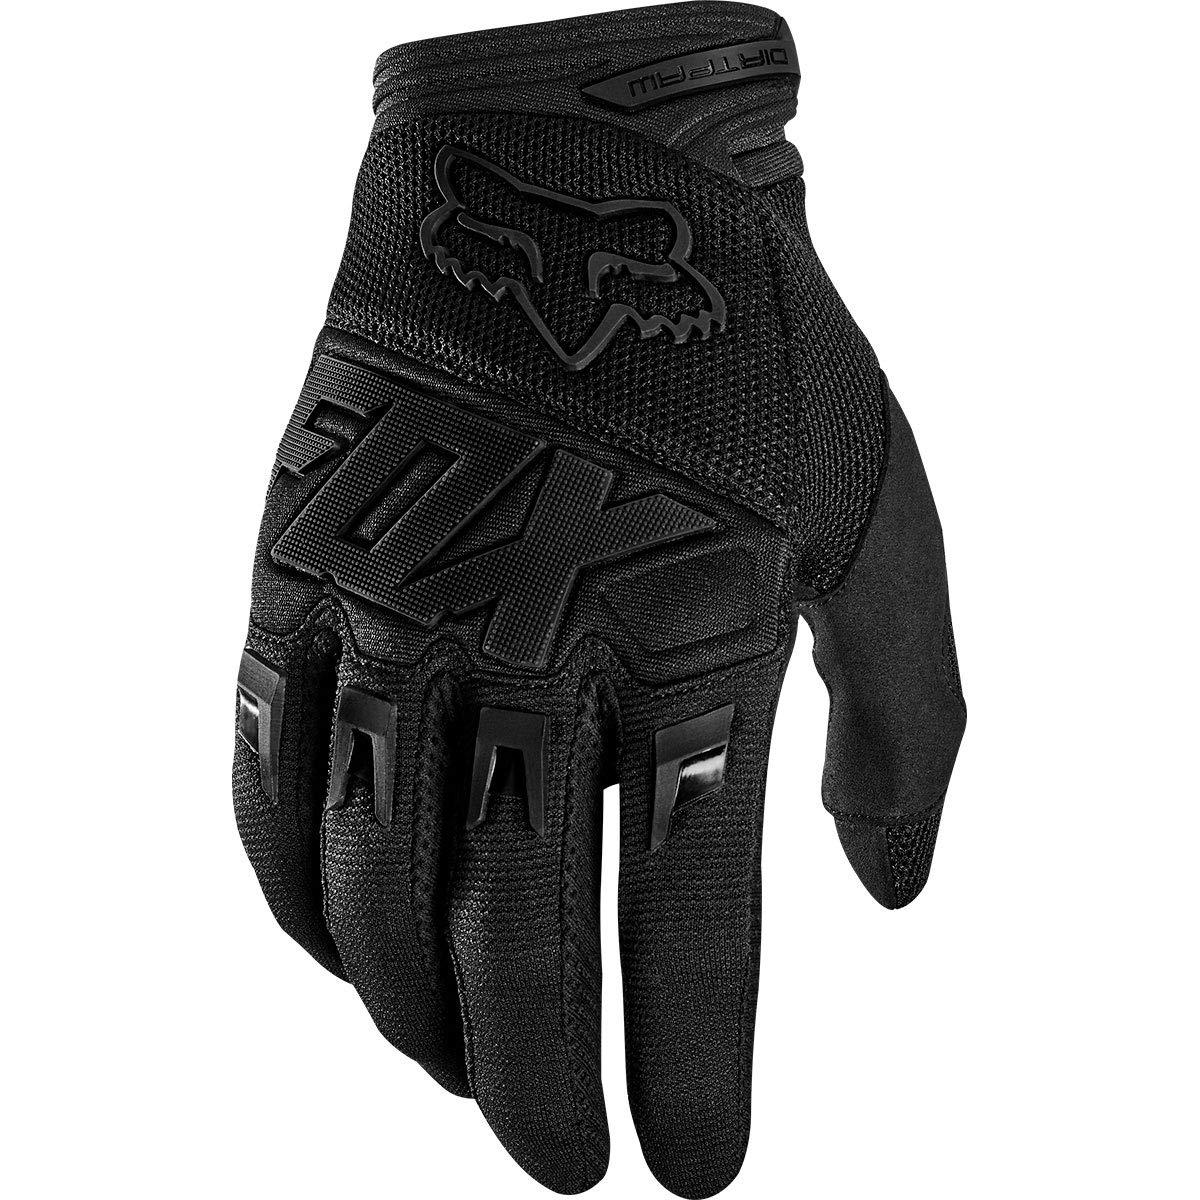 Fox Racing Dirtpaw - Race Men's Off-Road Motorcycle Gloves - Black/Black / 2X-Large